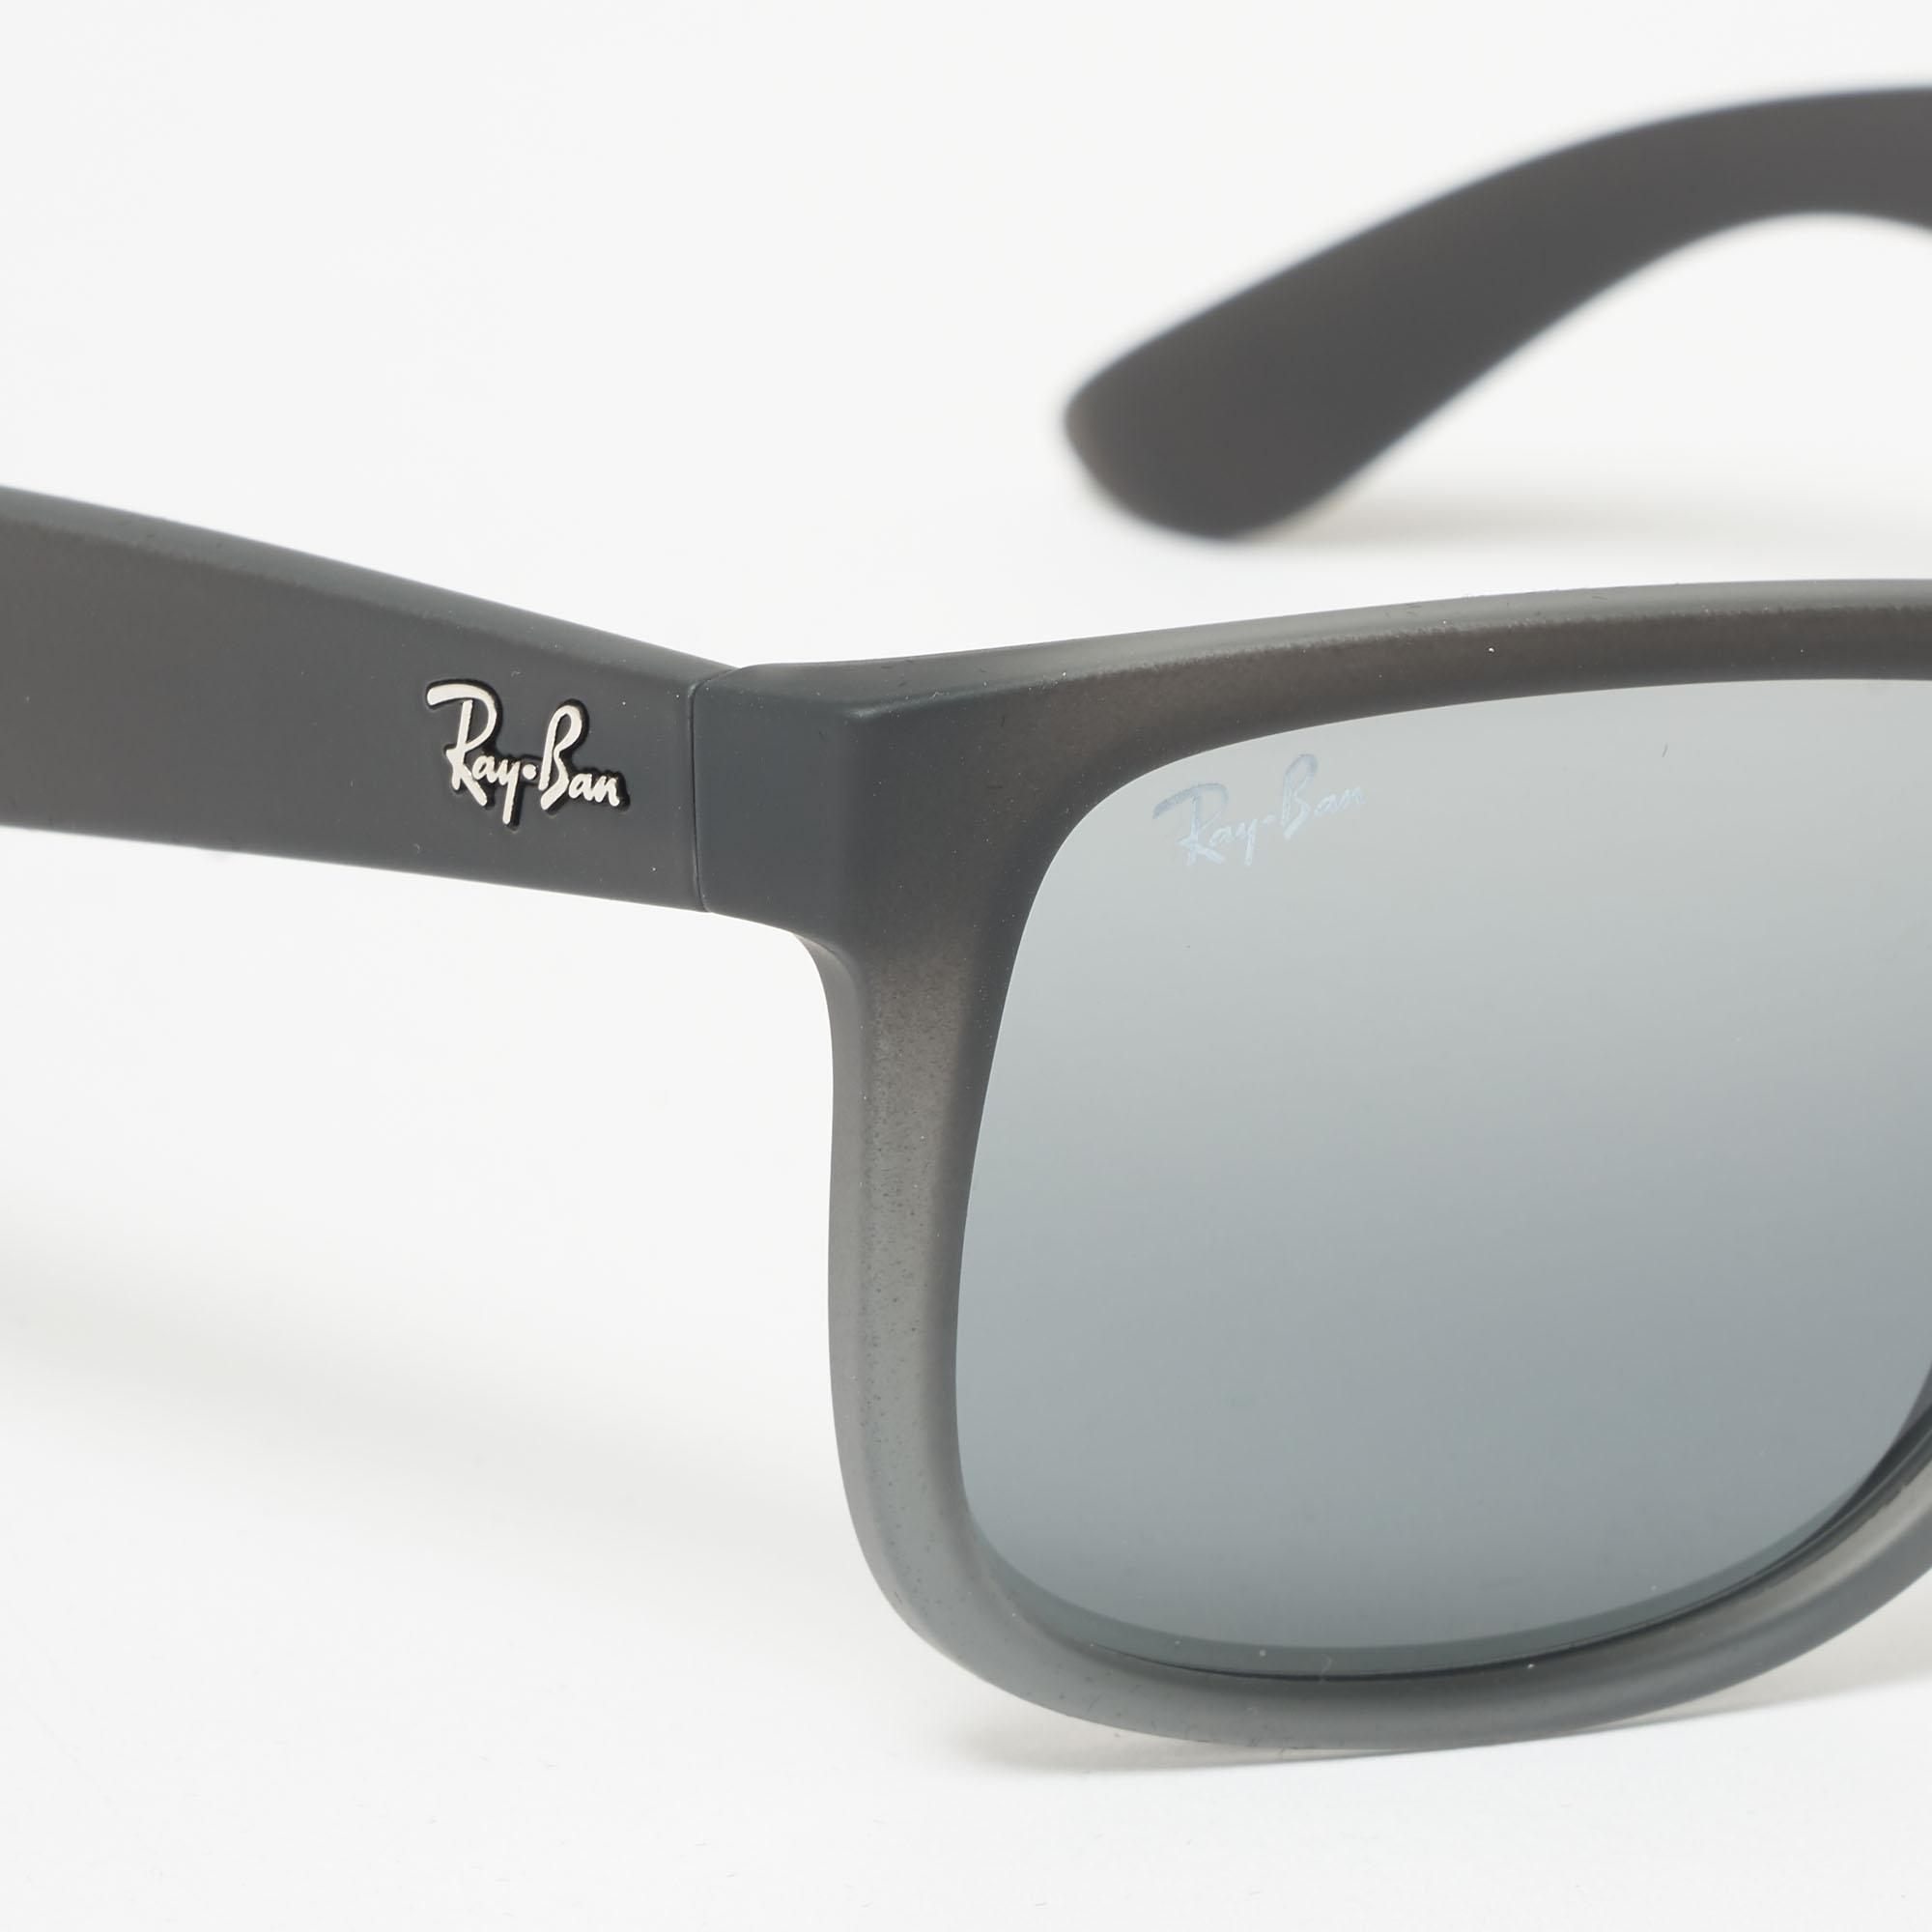 cbdad00ae9f7 Ray-Ban - Metallic Justin Sunglasses - Silver Gradient Mirror Lenses -  Lyst. View fullscreen